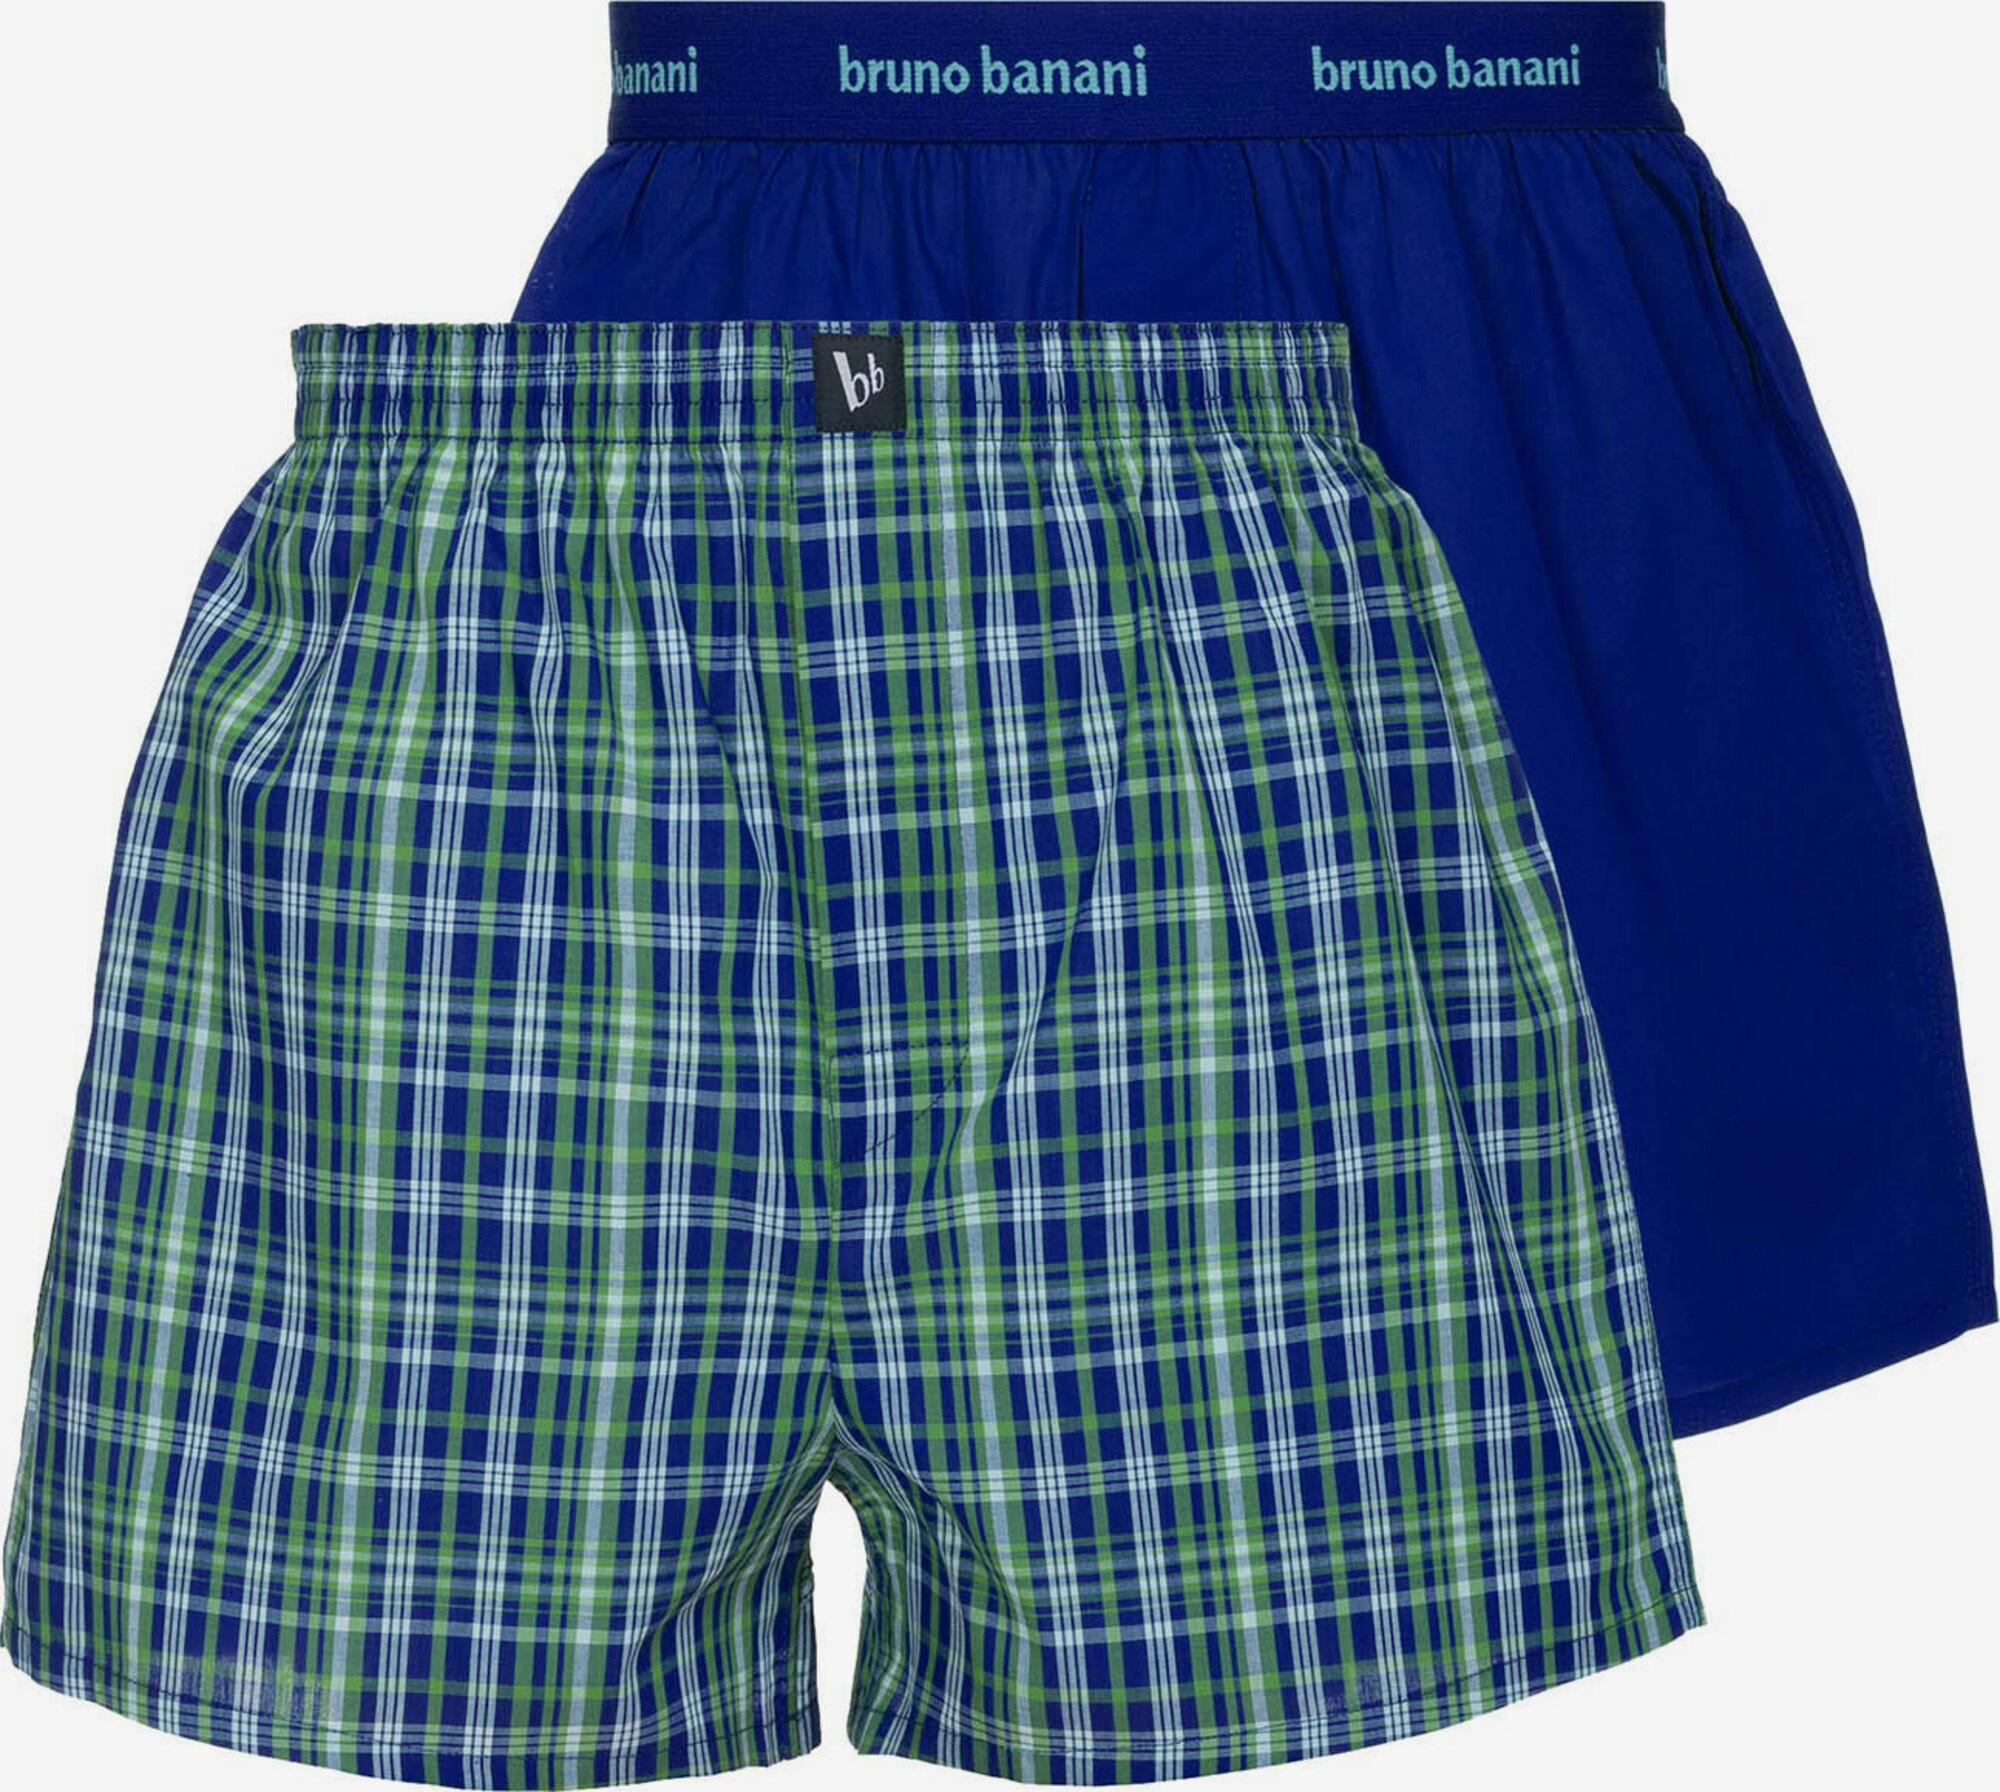 Комплект мужских трусов шорт (2 шт) 2201-2226/4111 Day dreamer синий-зеленый Bruno banani